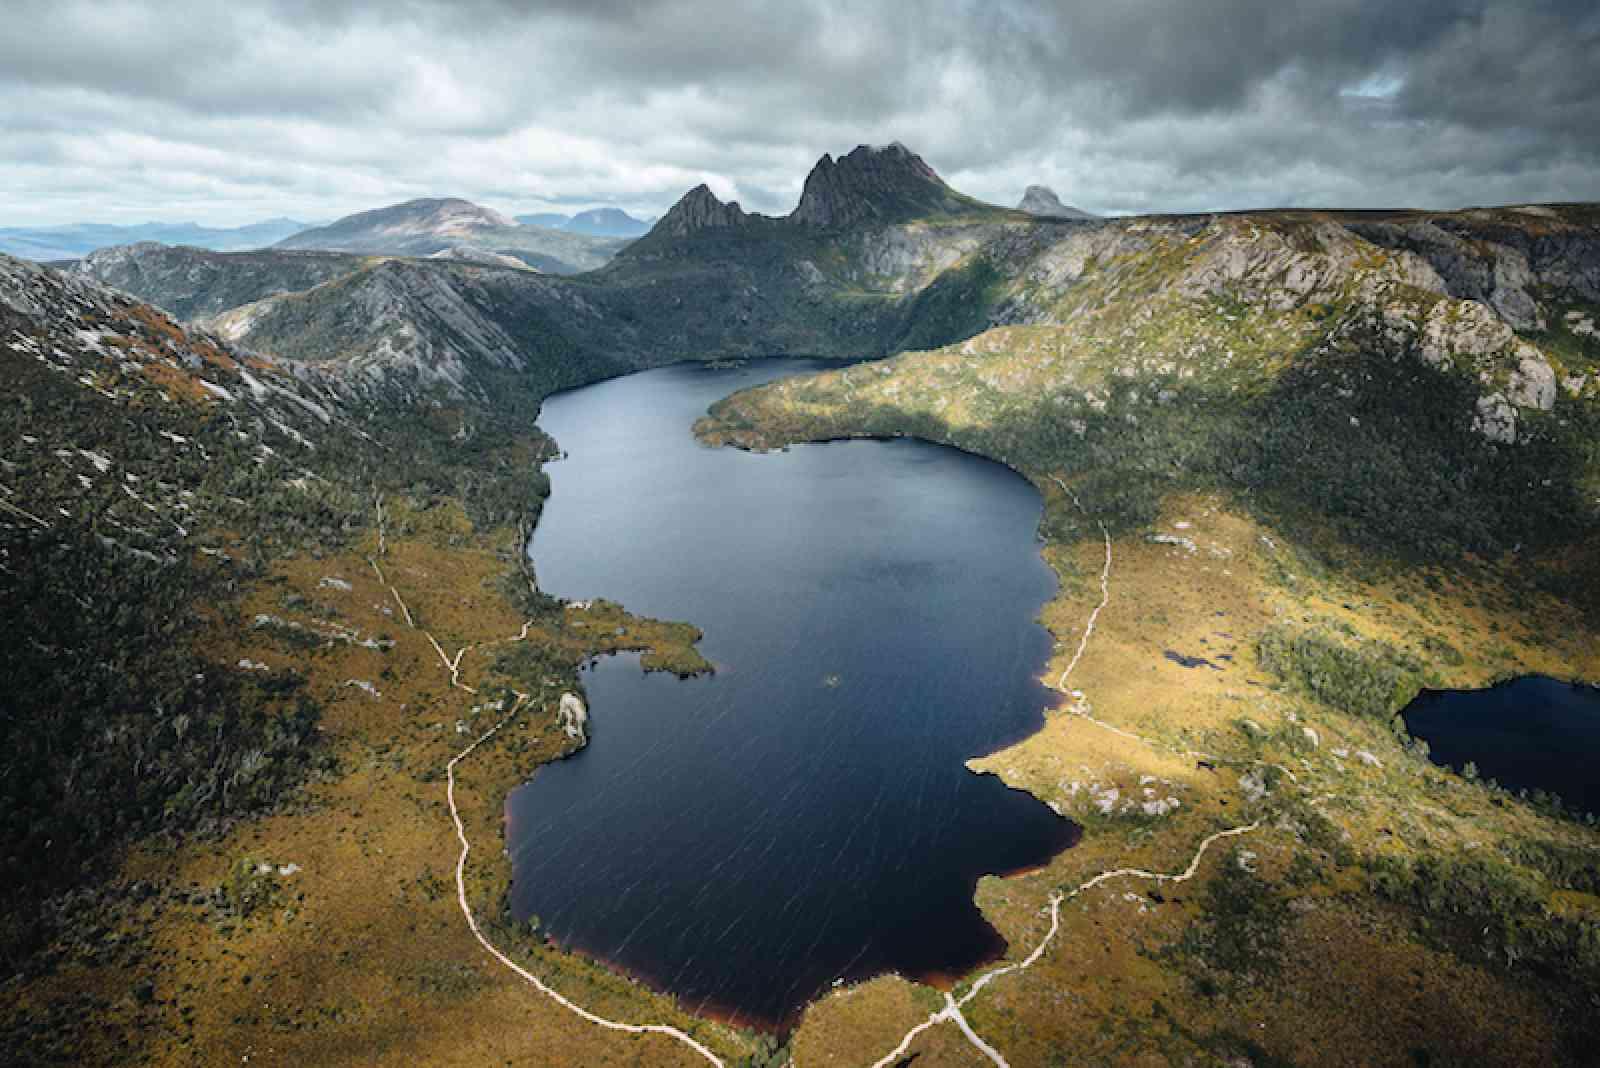 Dove Lake am Fuße des imposanten Cradel Mountain in Tasmanien